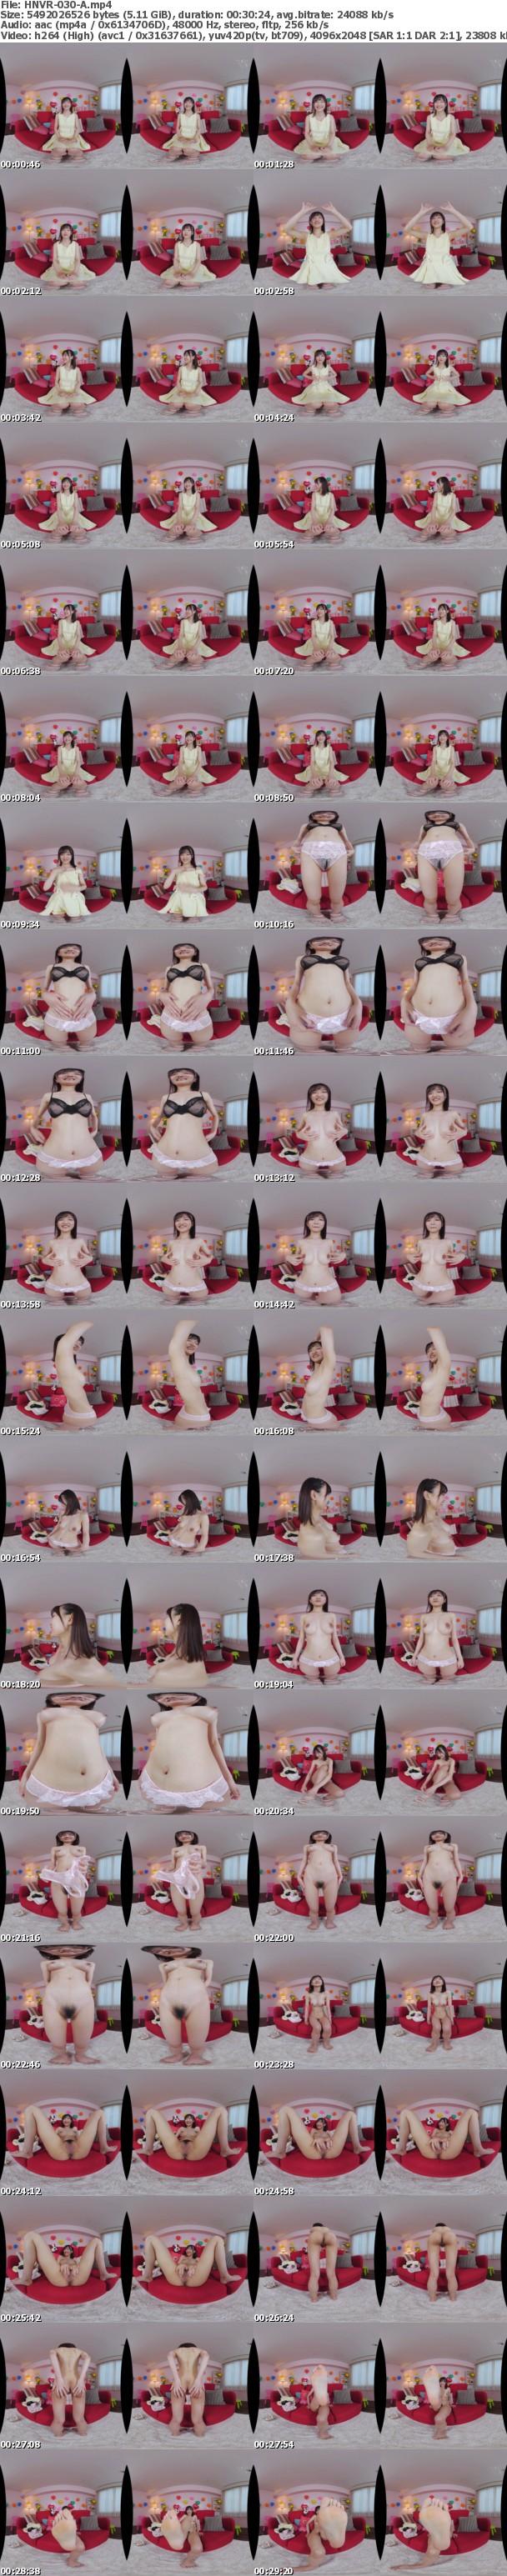 (VR) HNVR-030 さっきまで恥ずかしそうにインタビューに応えてくれた女のコと生SEX! 脱がせたら形のいいFカップ乳 プリンと上向きかわいい乳首にウエスト51cmの極細くびれ 神スリム女子大生初めての中出しVR 乙葉カレン